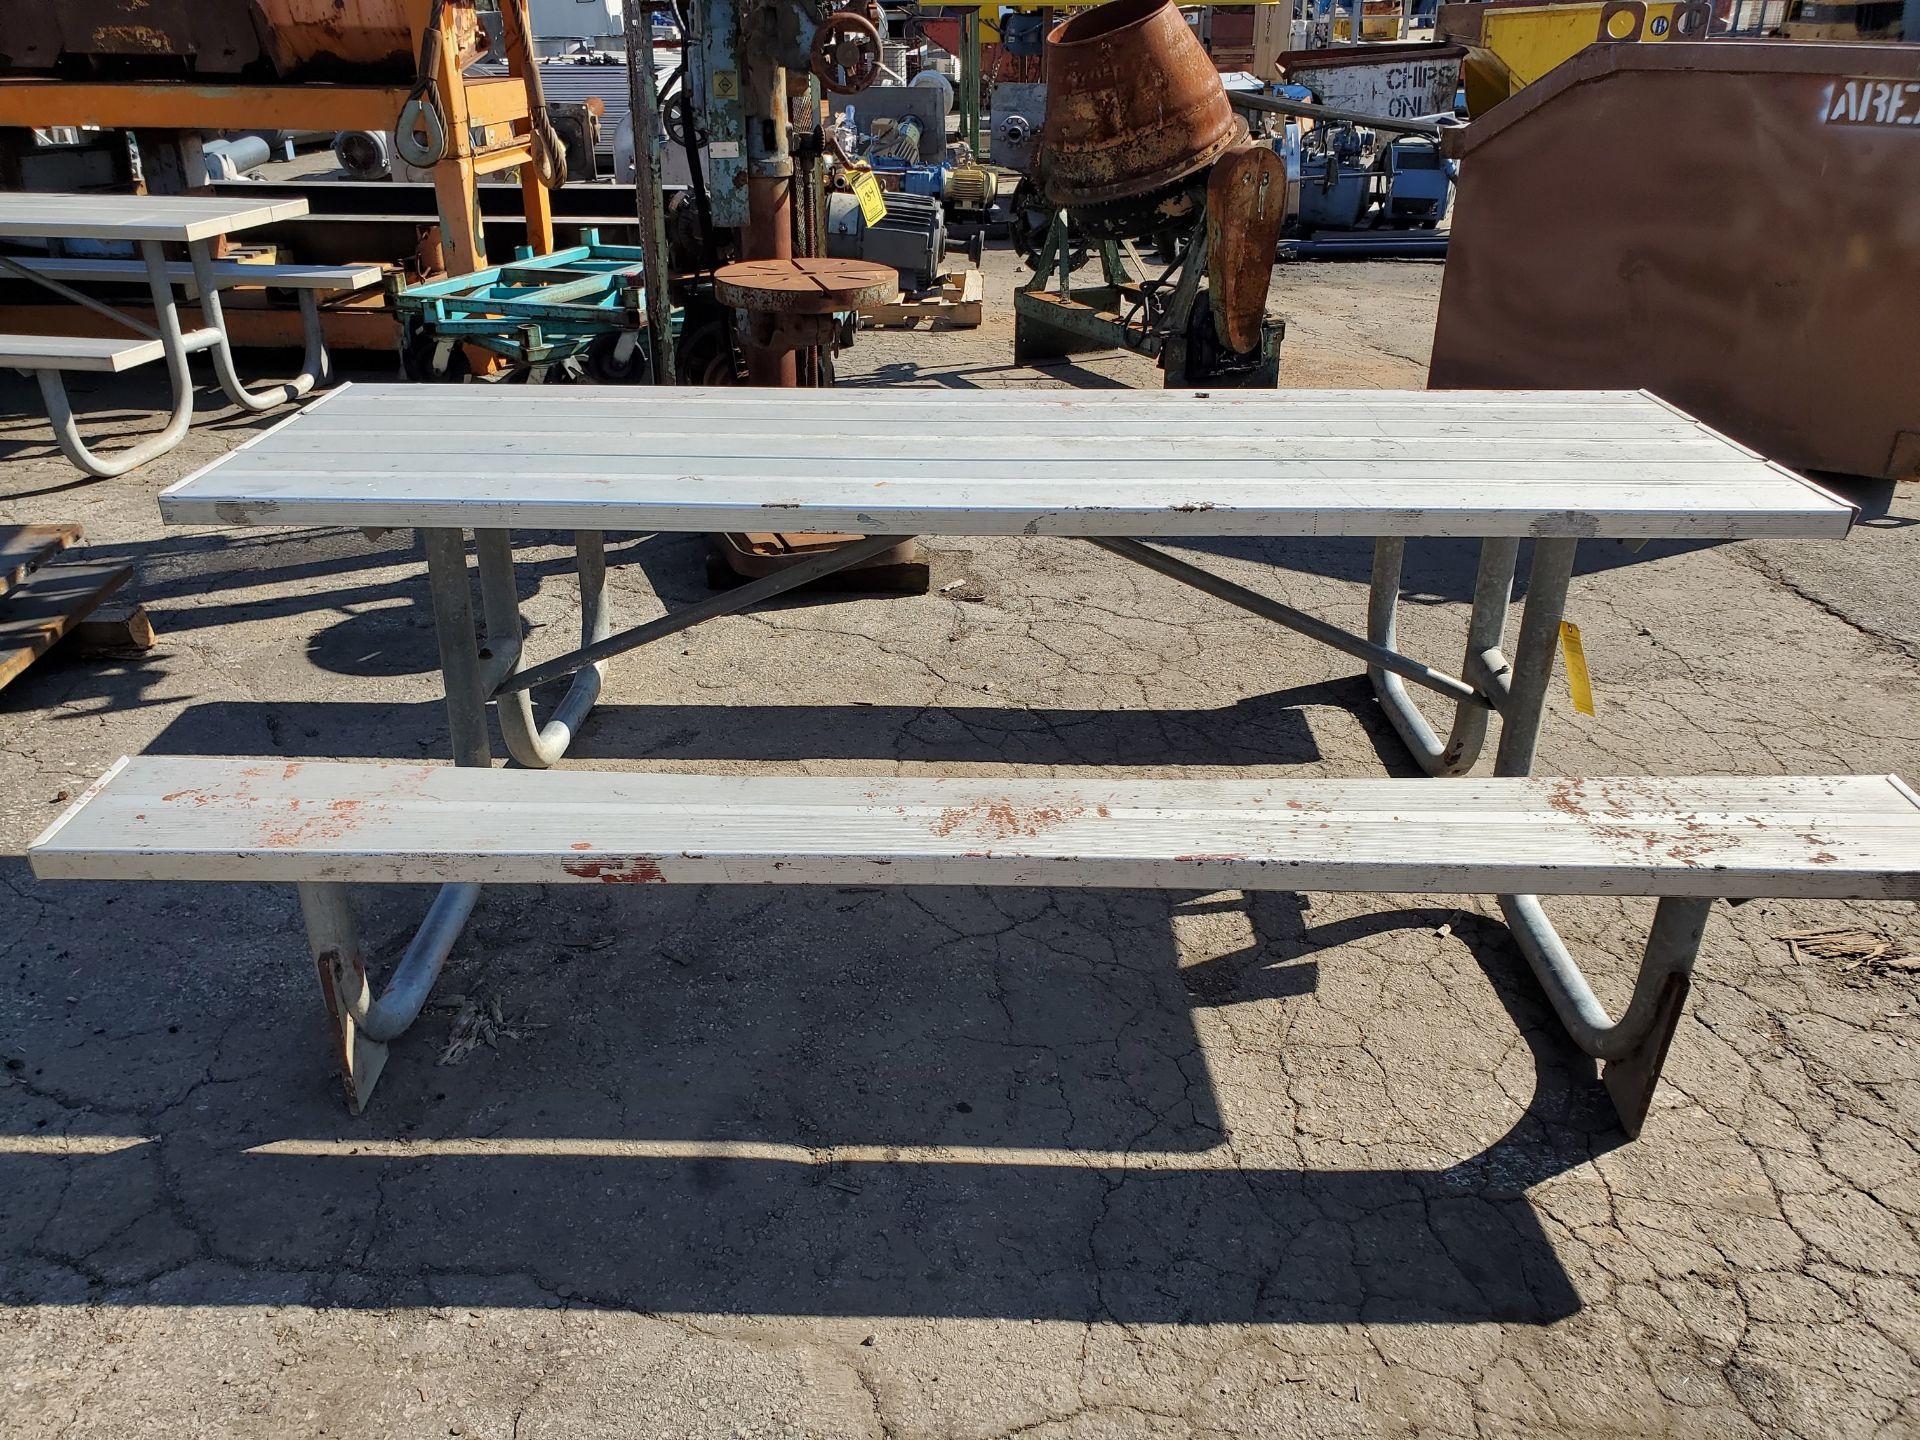 Lot 152 - 8' ALUMINUM PICNIC TABLE